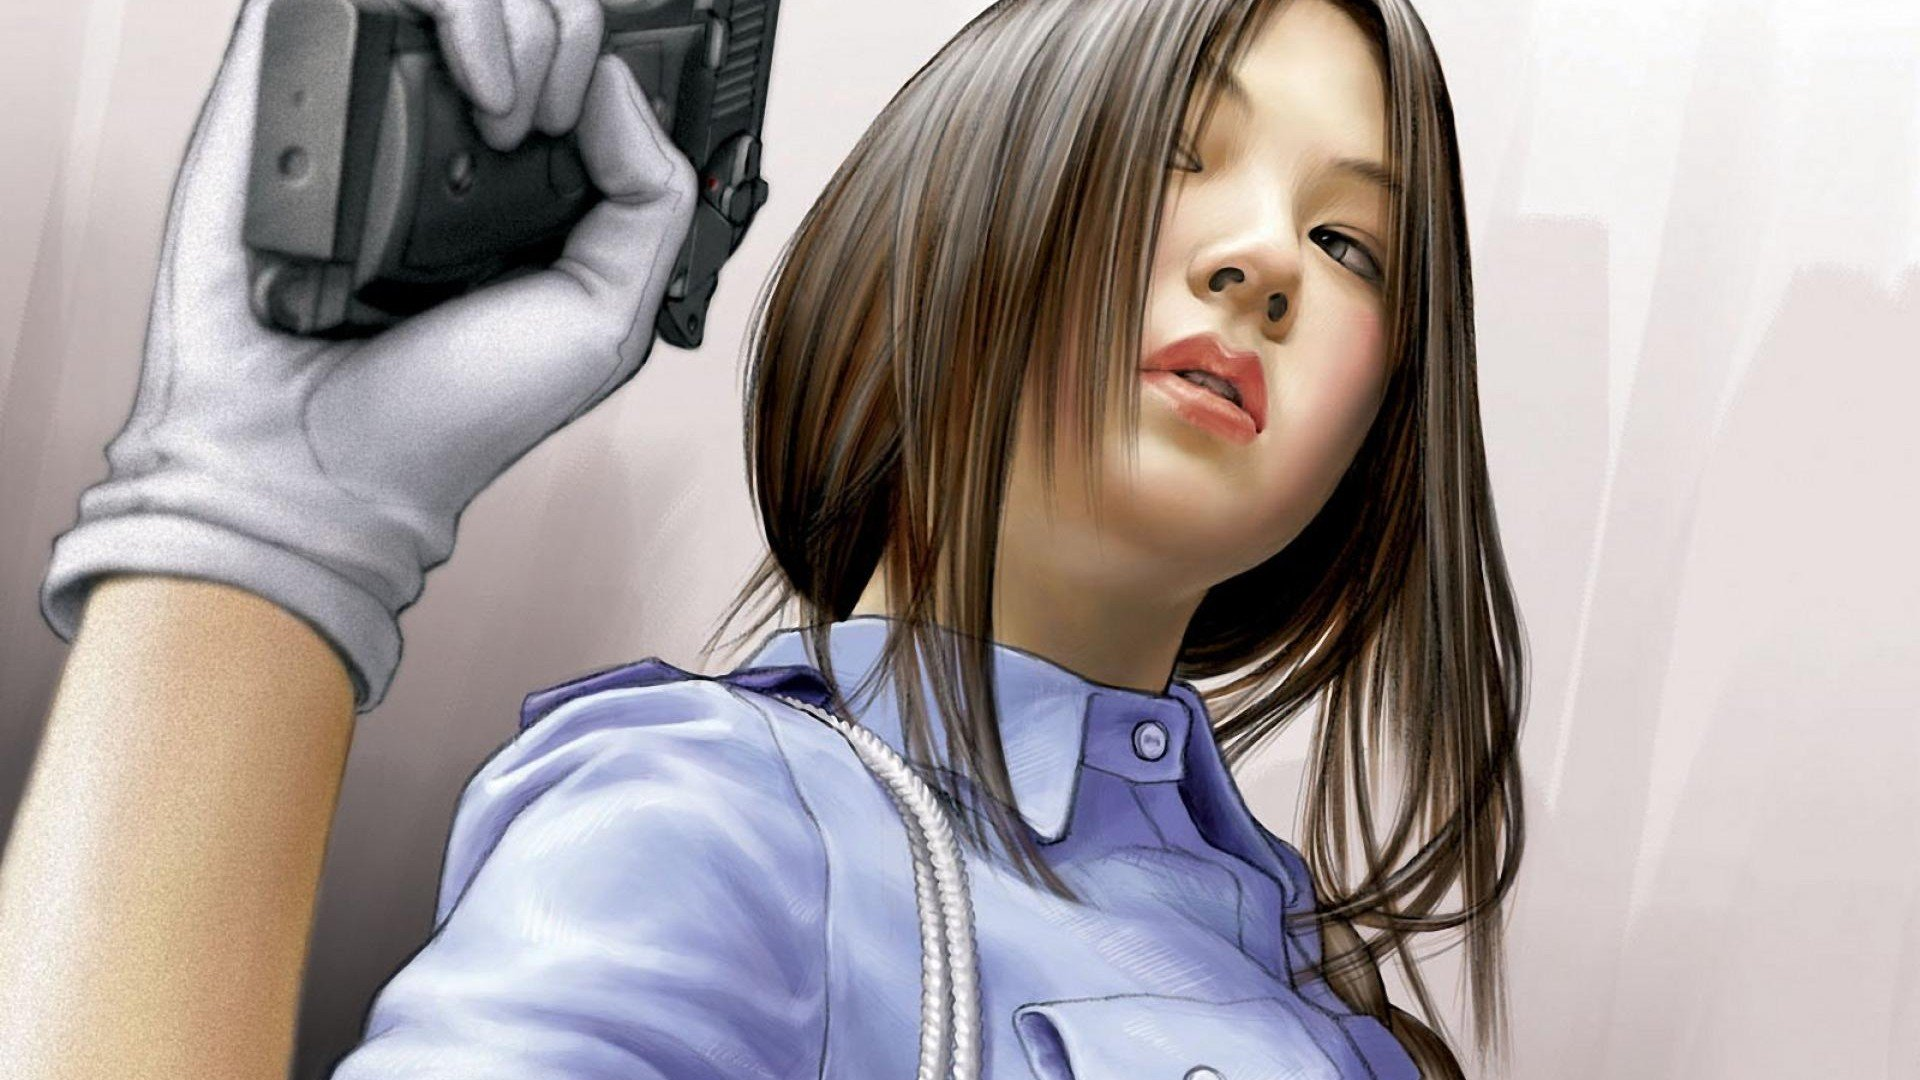 Unduh 6600 Koleksi Wallpaper Animasi Girl 3d Gambar Terbaik